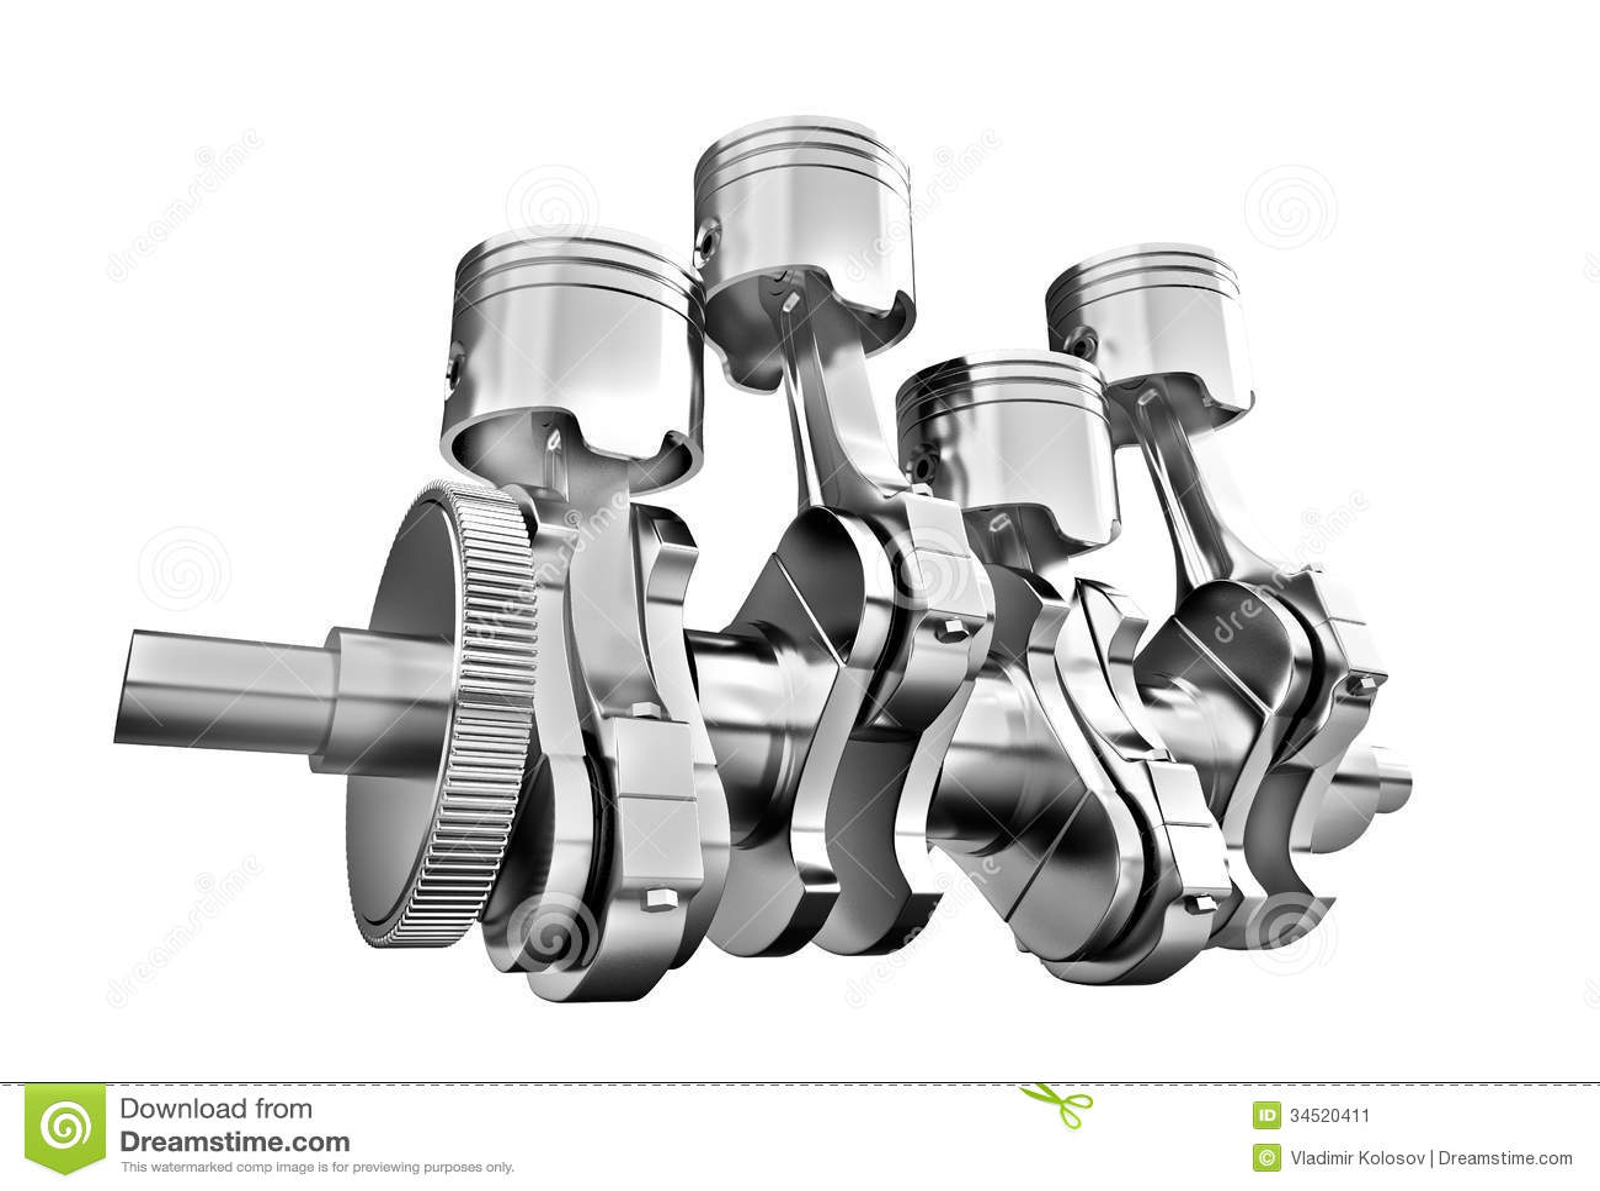 V8 Engine Clipart Engine pistons and cog